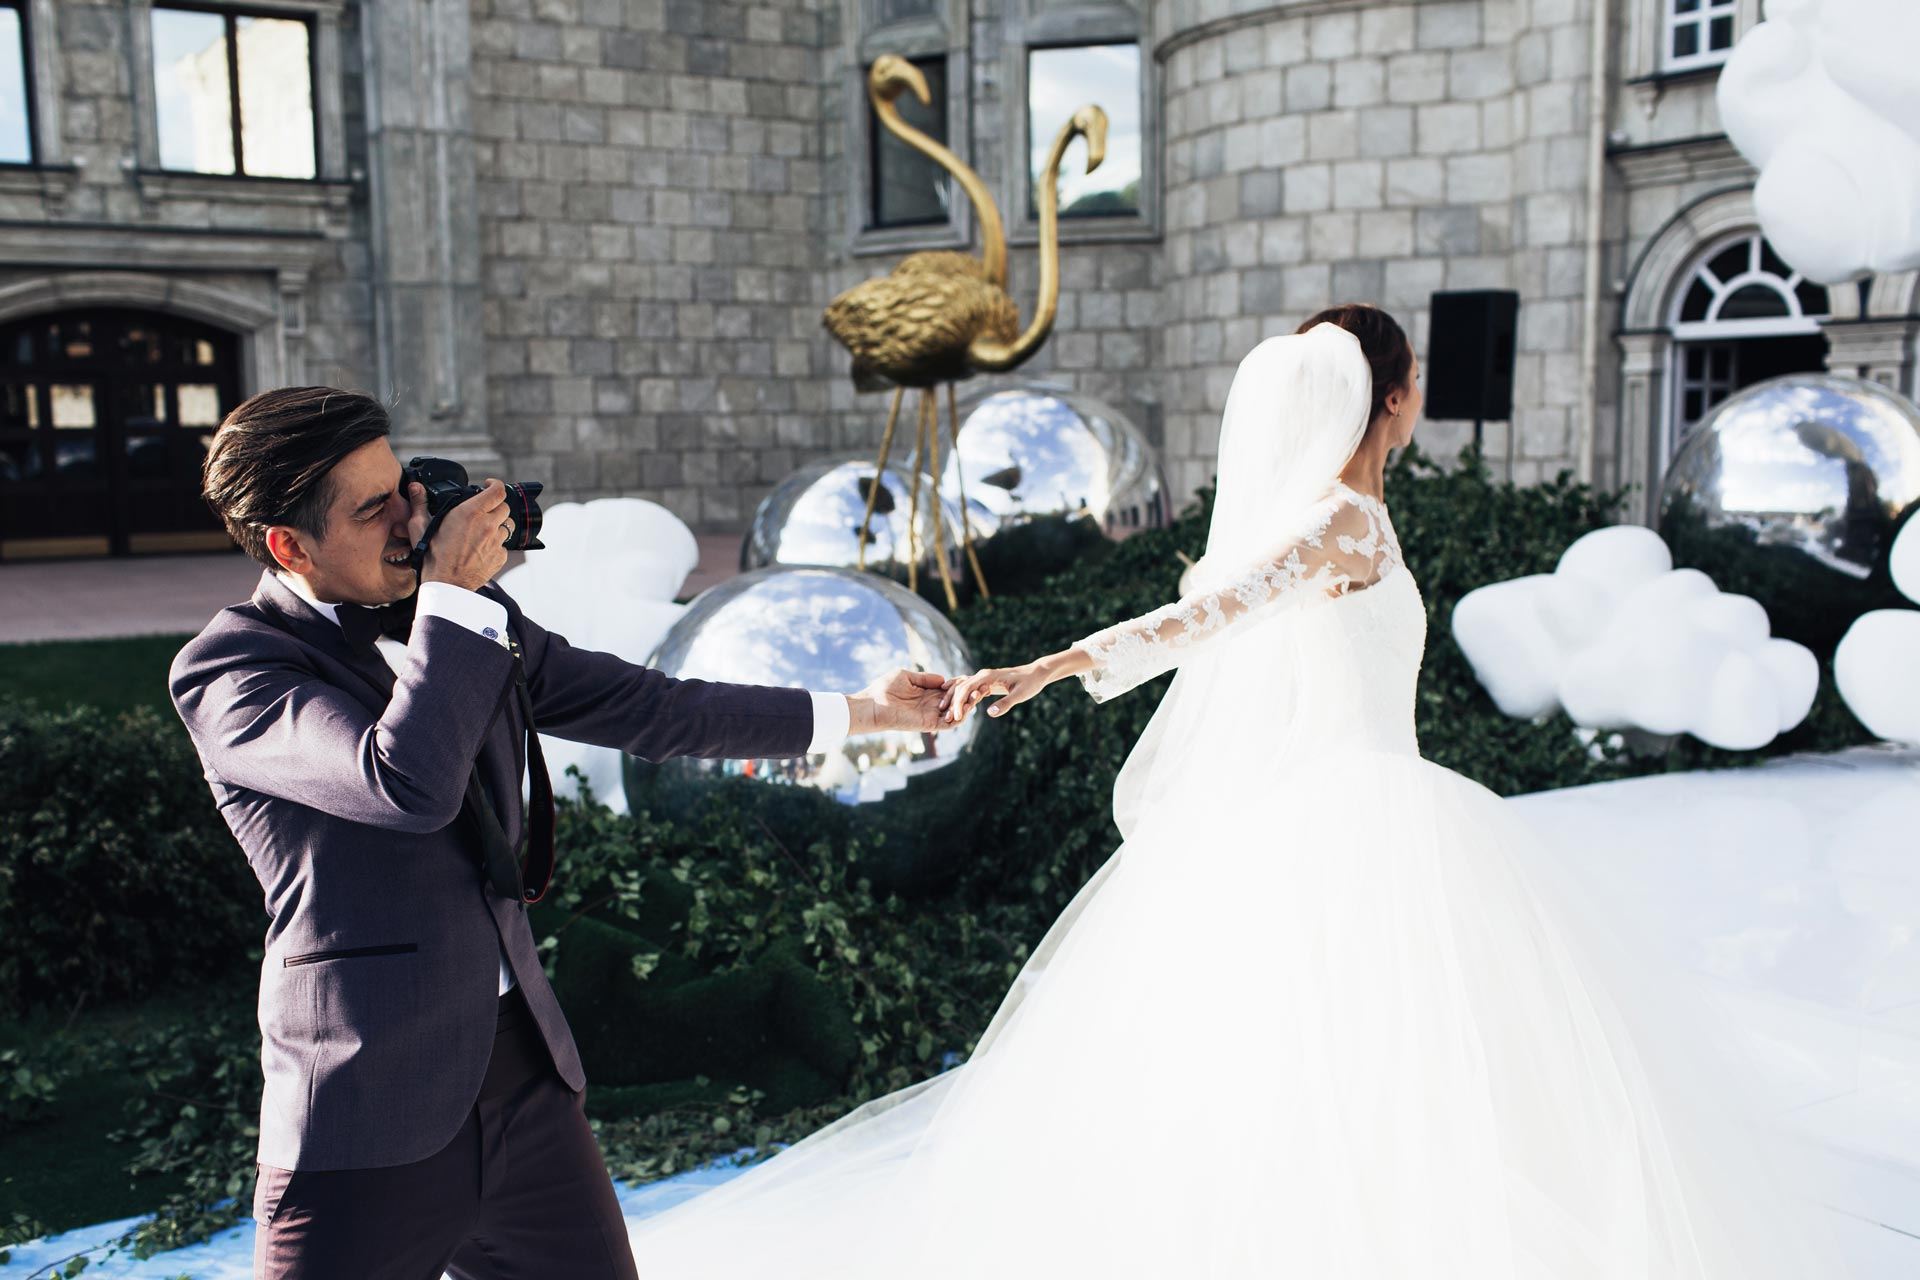 Follow me to. Свадьба Натальи и Мурада Османн фото 4